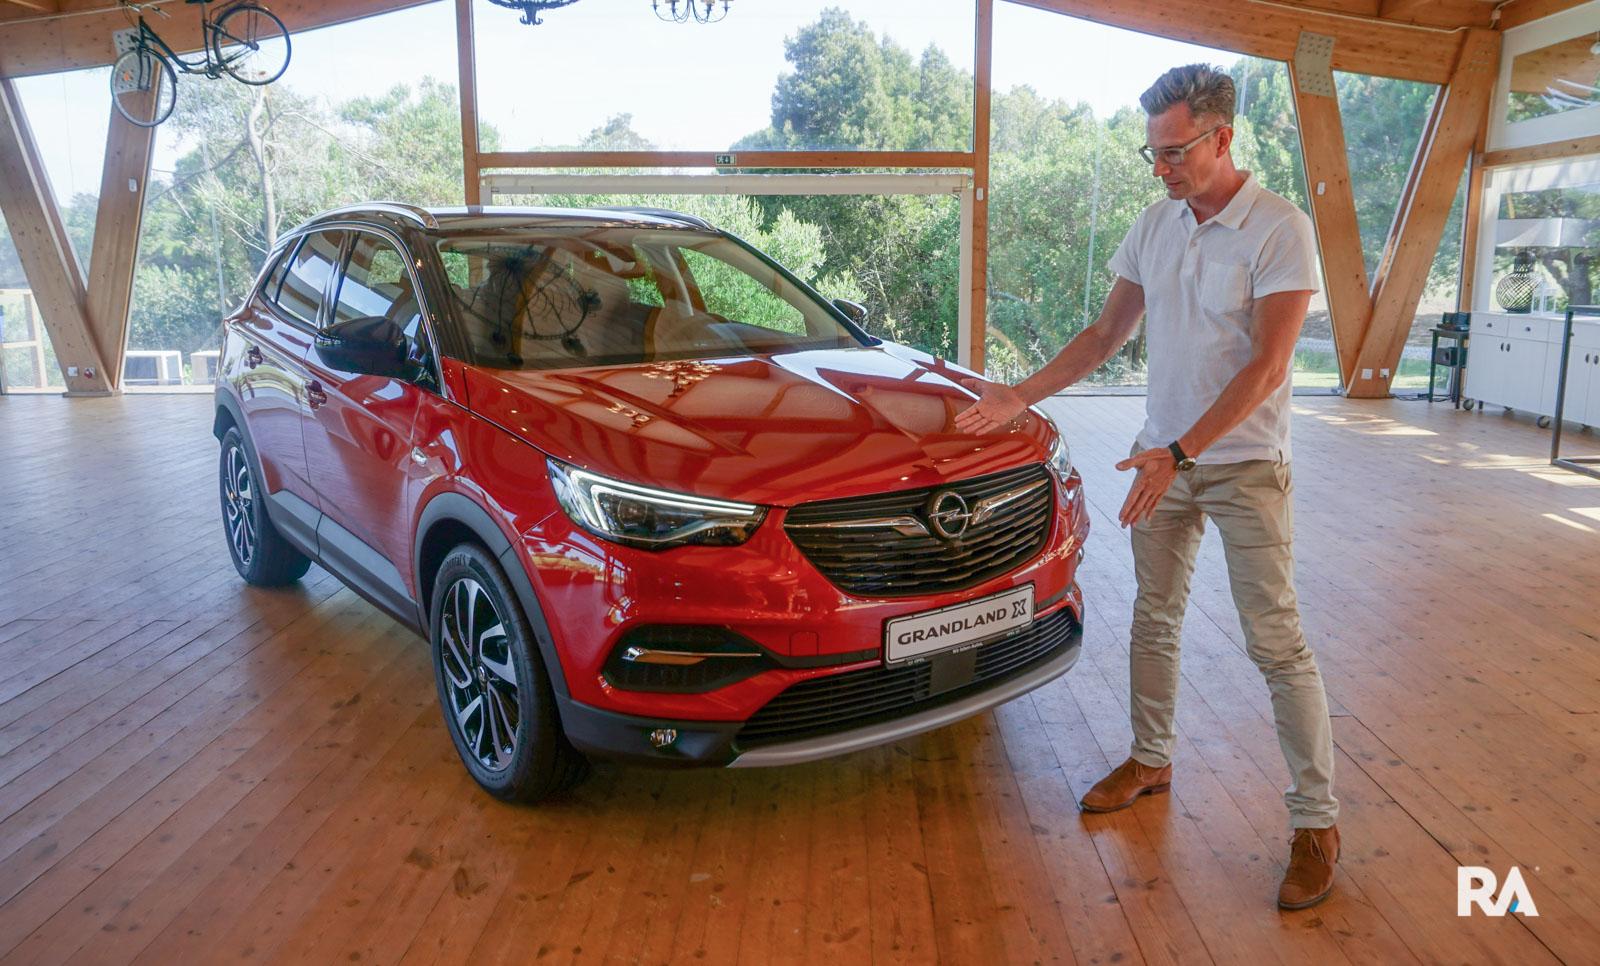 Fredrik Backman e Opel Grandland X